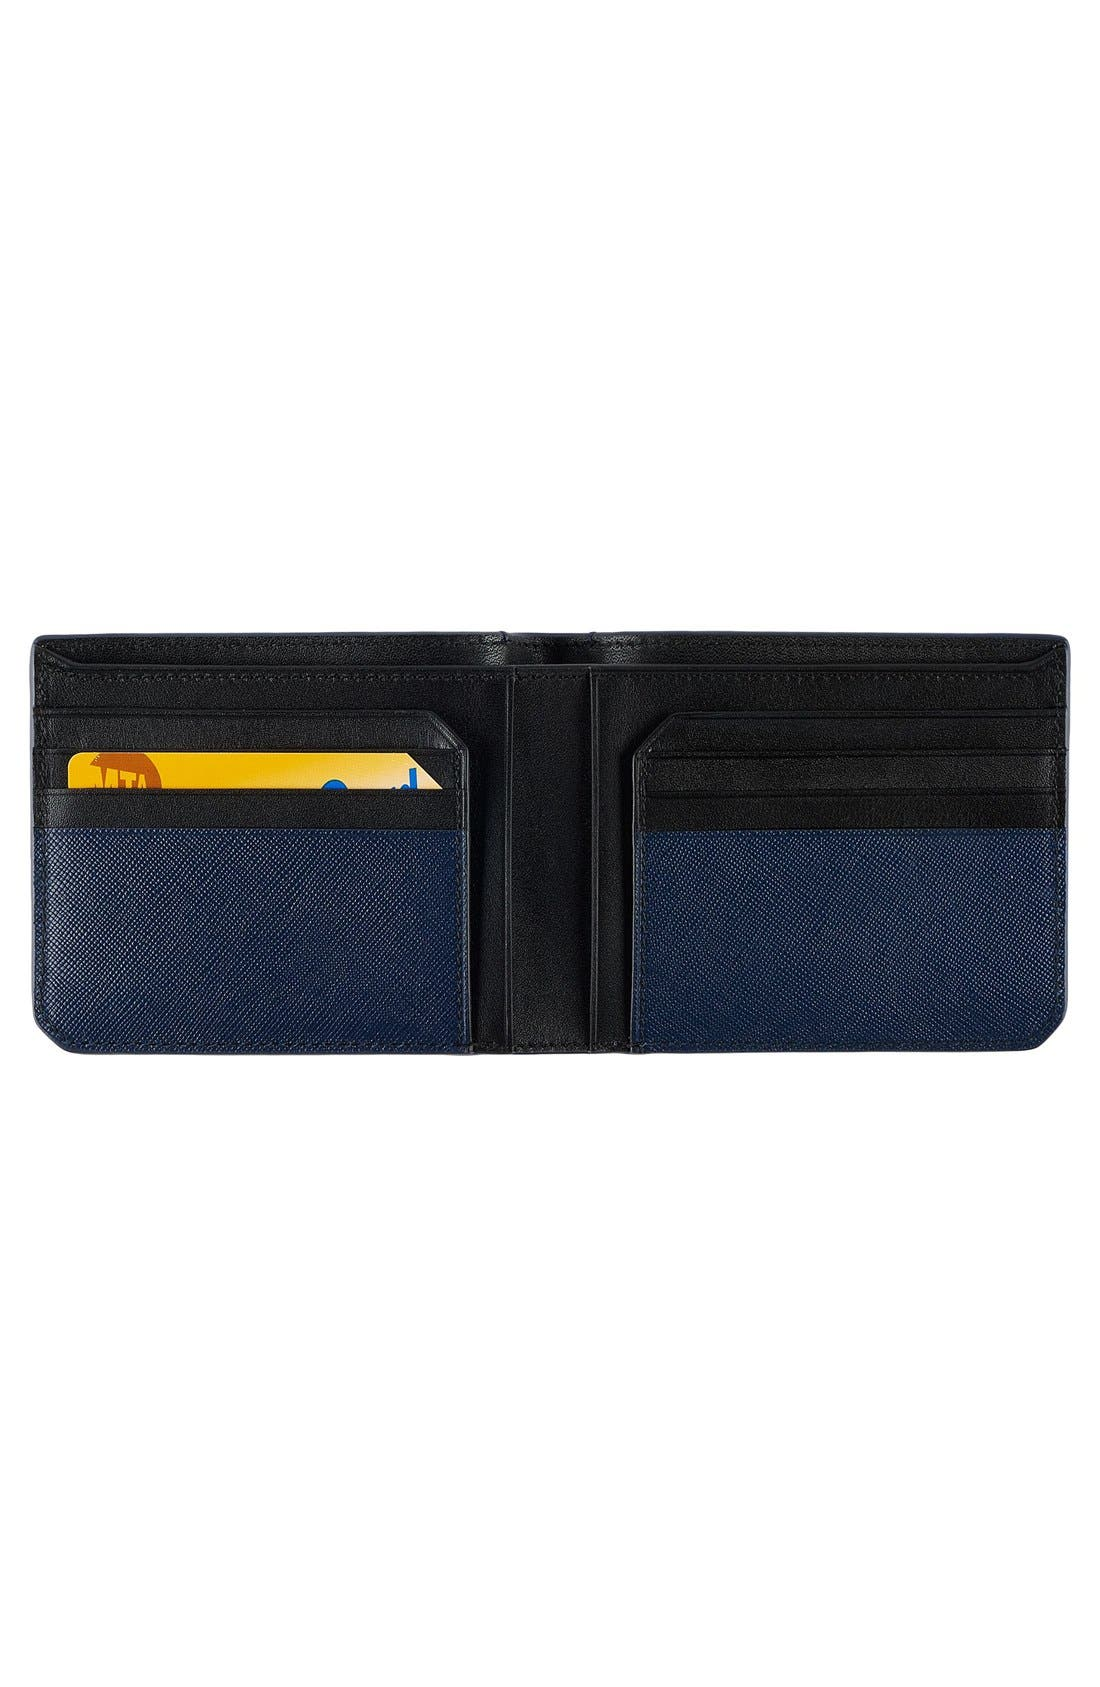 Leather Wallet,                             Alternate thumbnail 2, color,                             Indigo